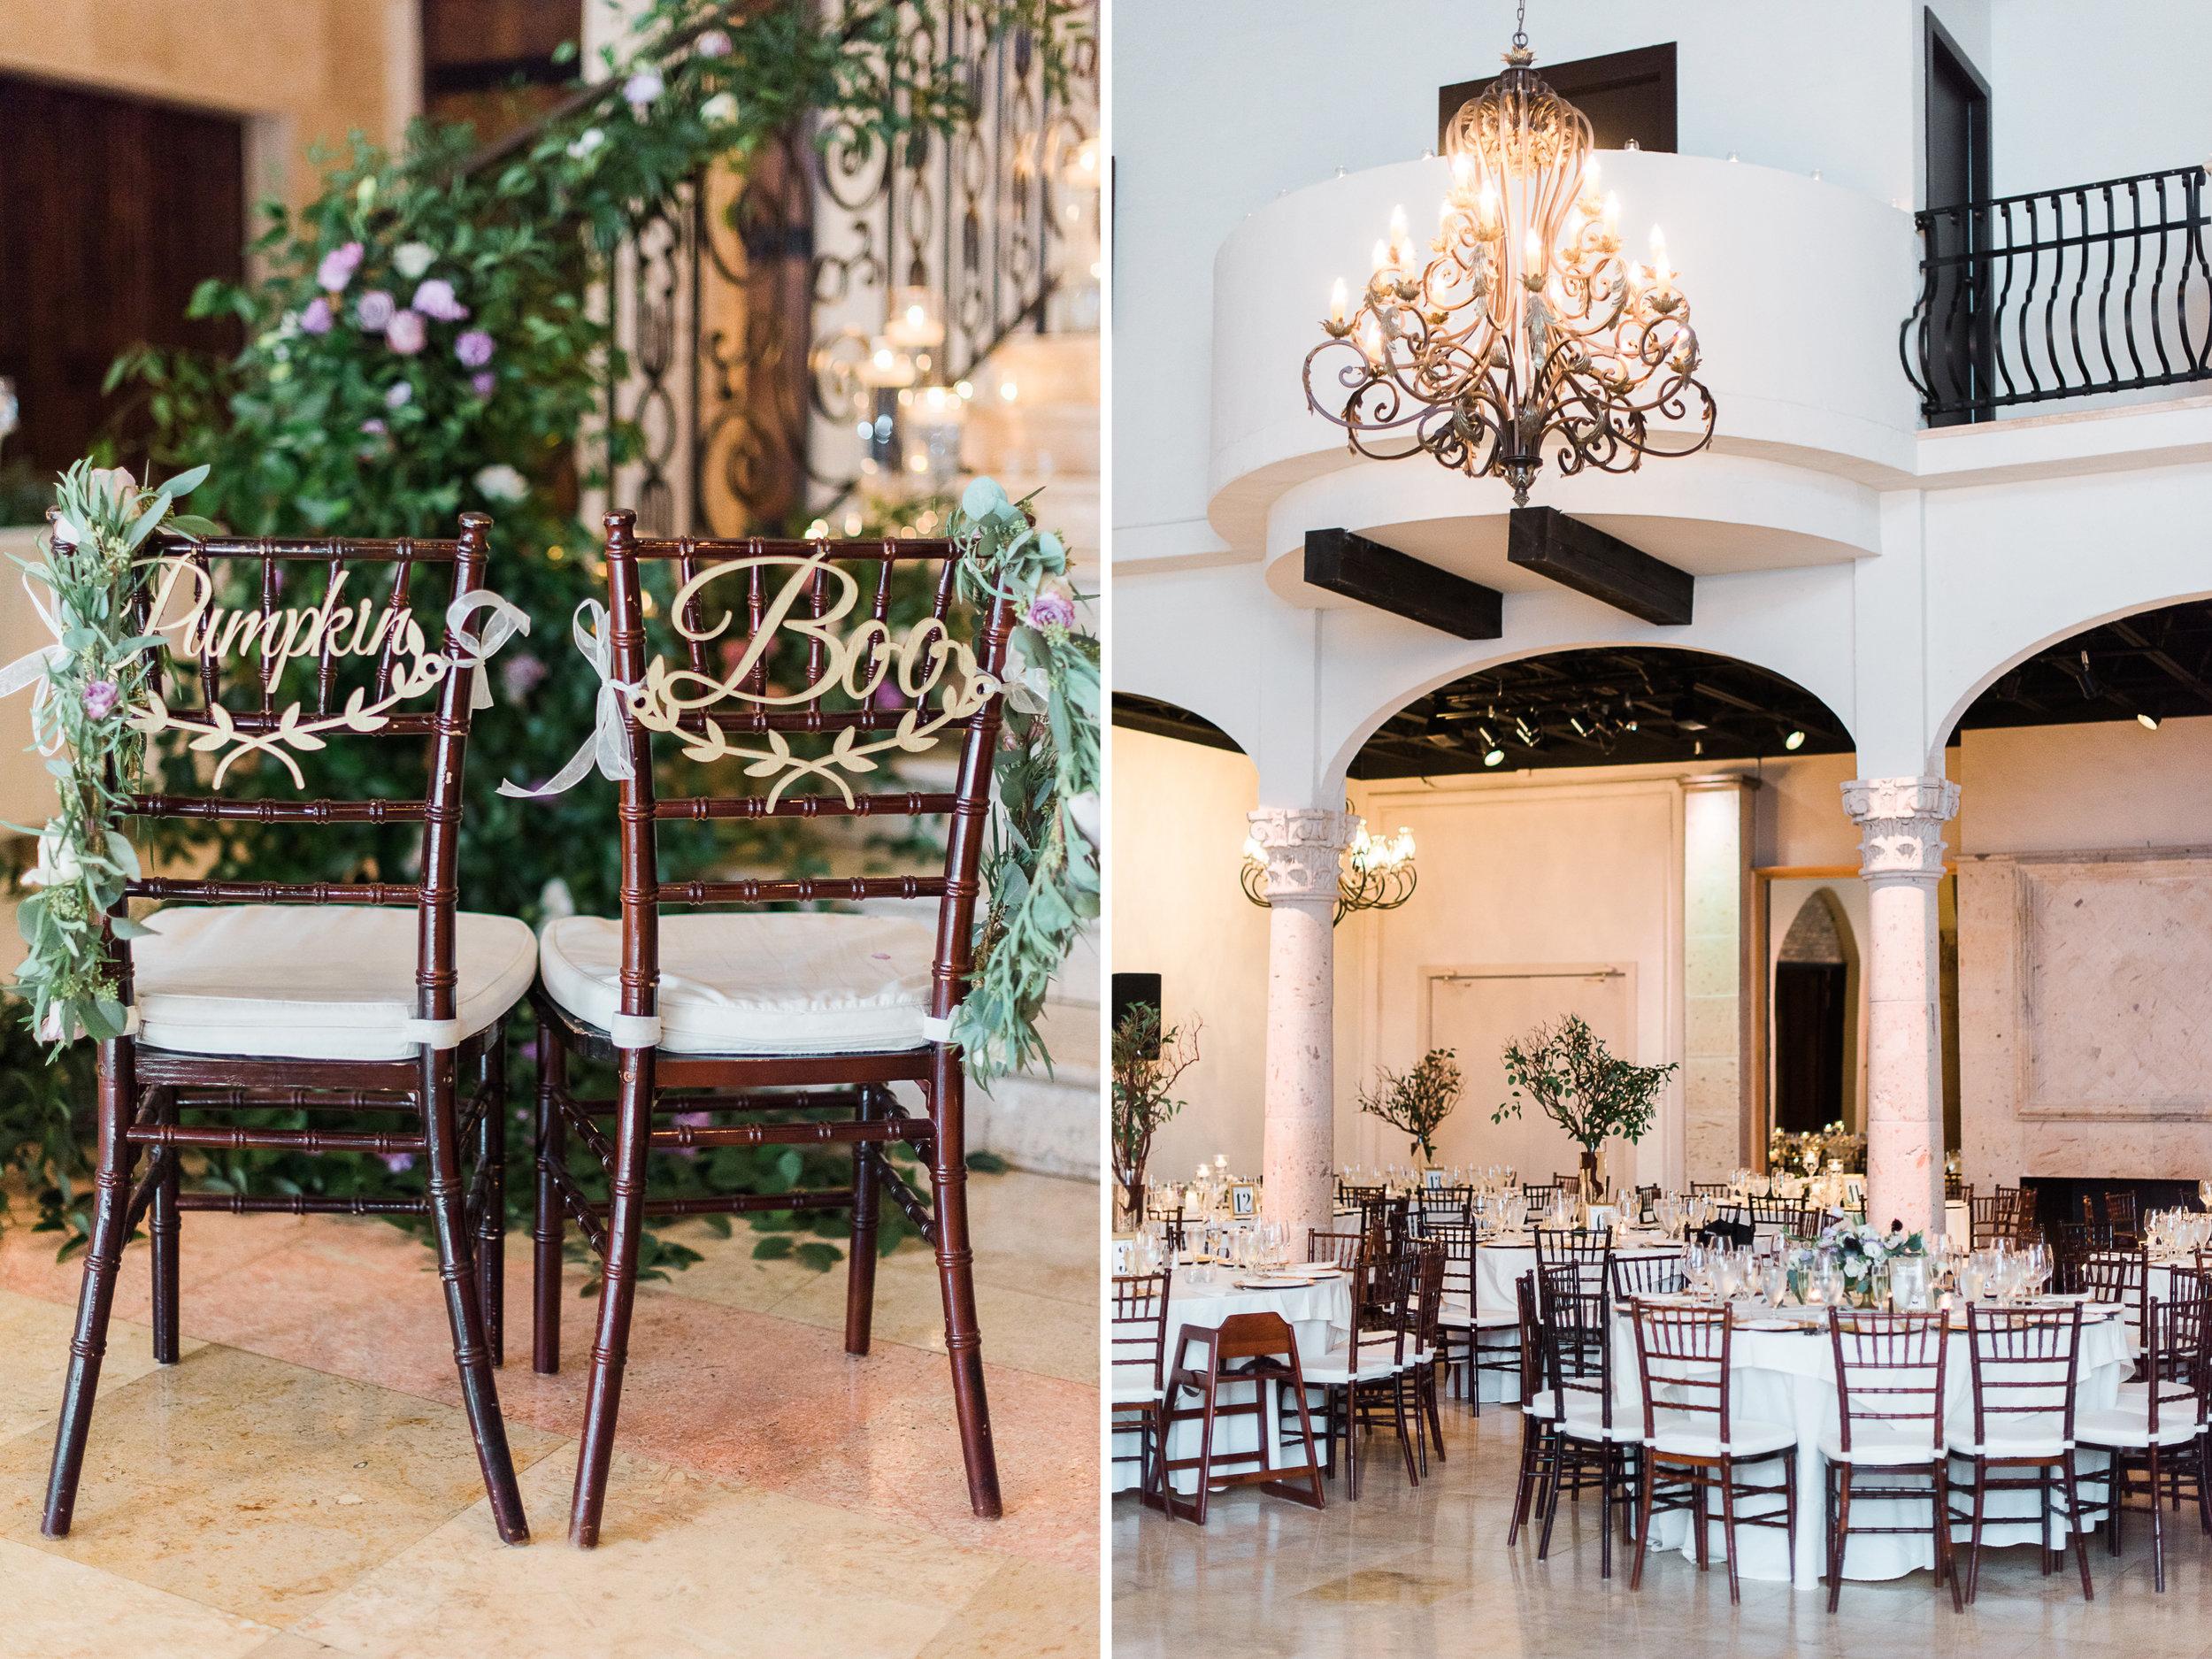 Fine-Art-Film-Houston-Wedding-Photographer-Best-Top-Luxury-Texas-Austin-Dallas-Destination-Dana-Fernandez-Photography-The-Bell-Tower-on-34th-Indian-9-121.jpg